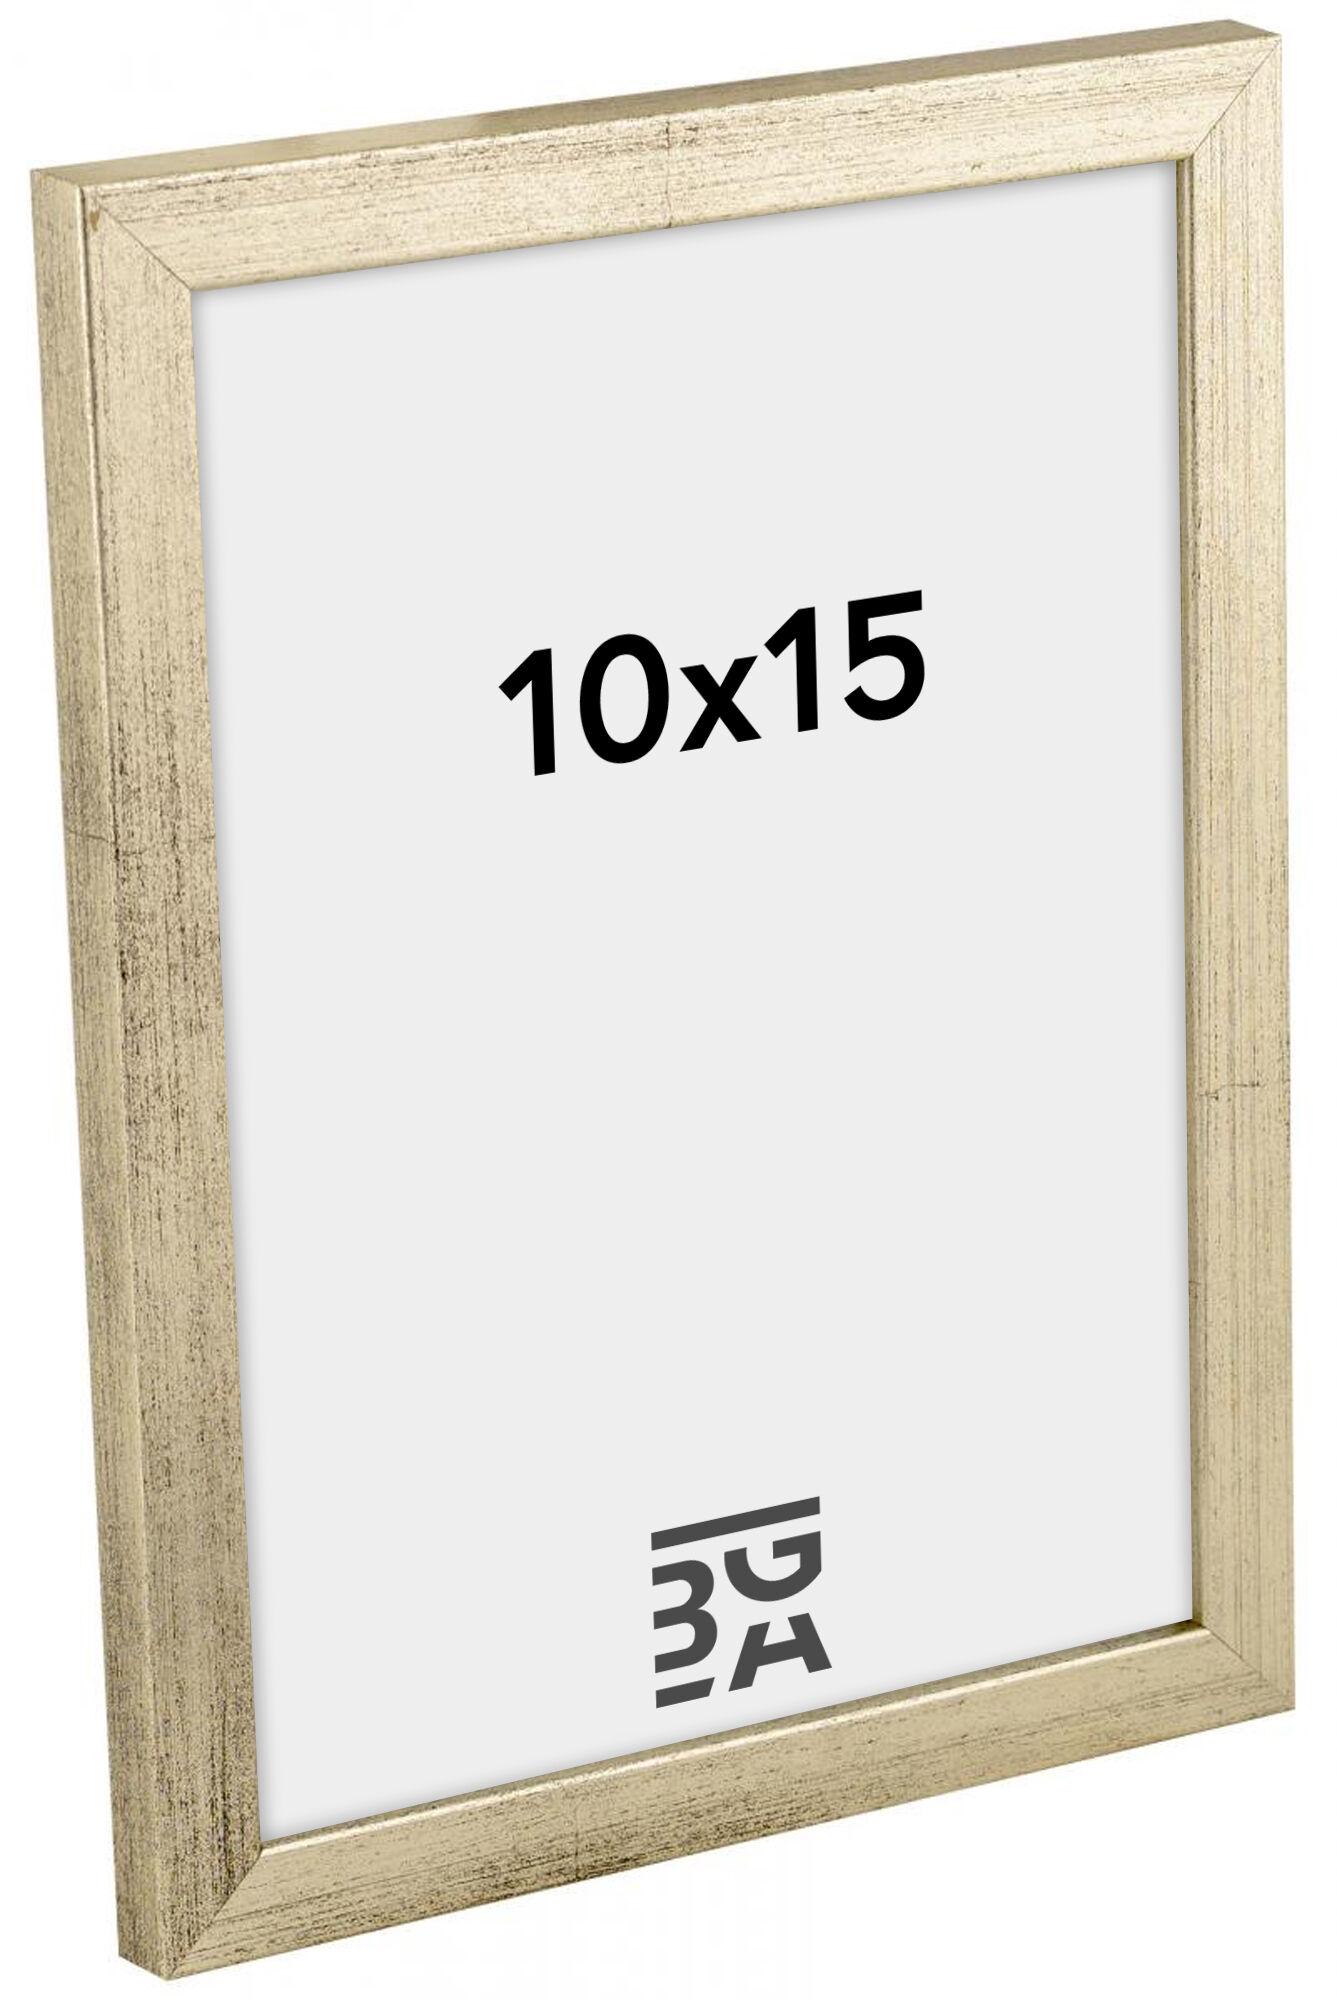 Estancia Galant Hopeanvärinen 10x15 cm